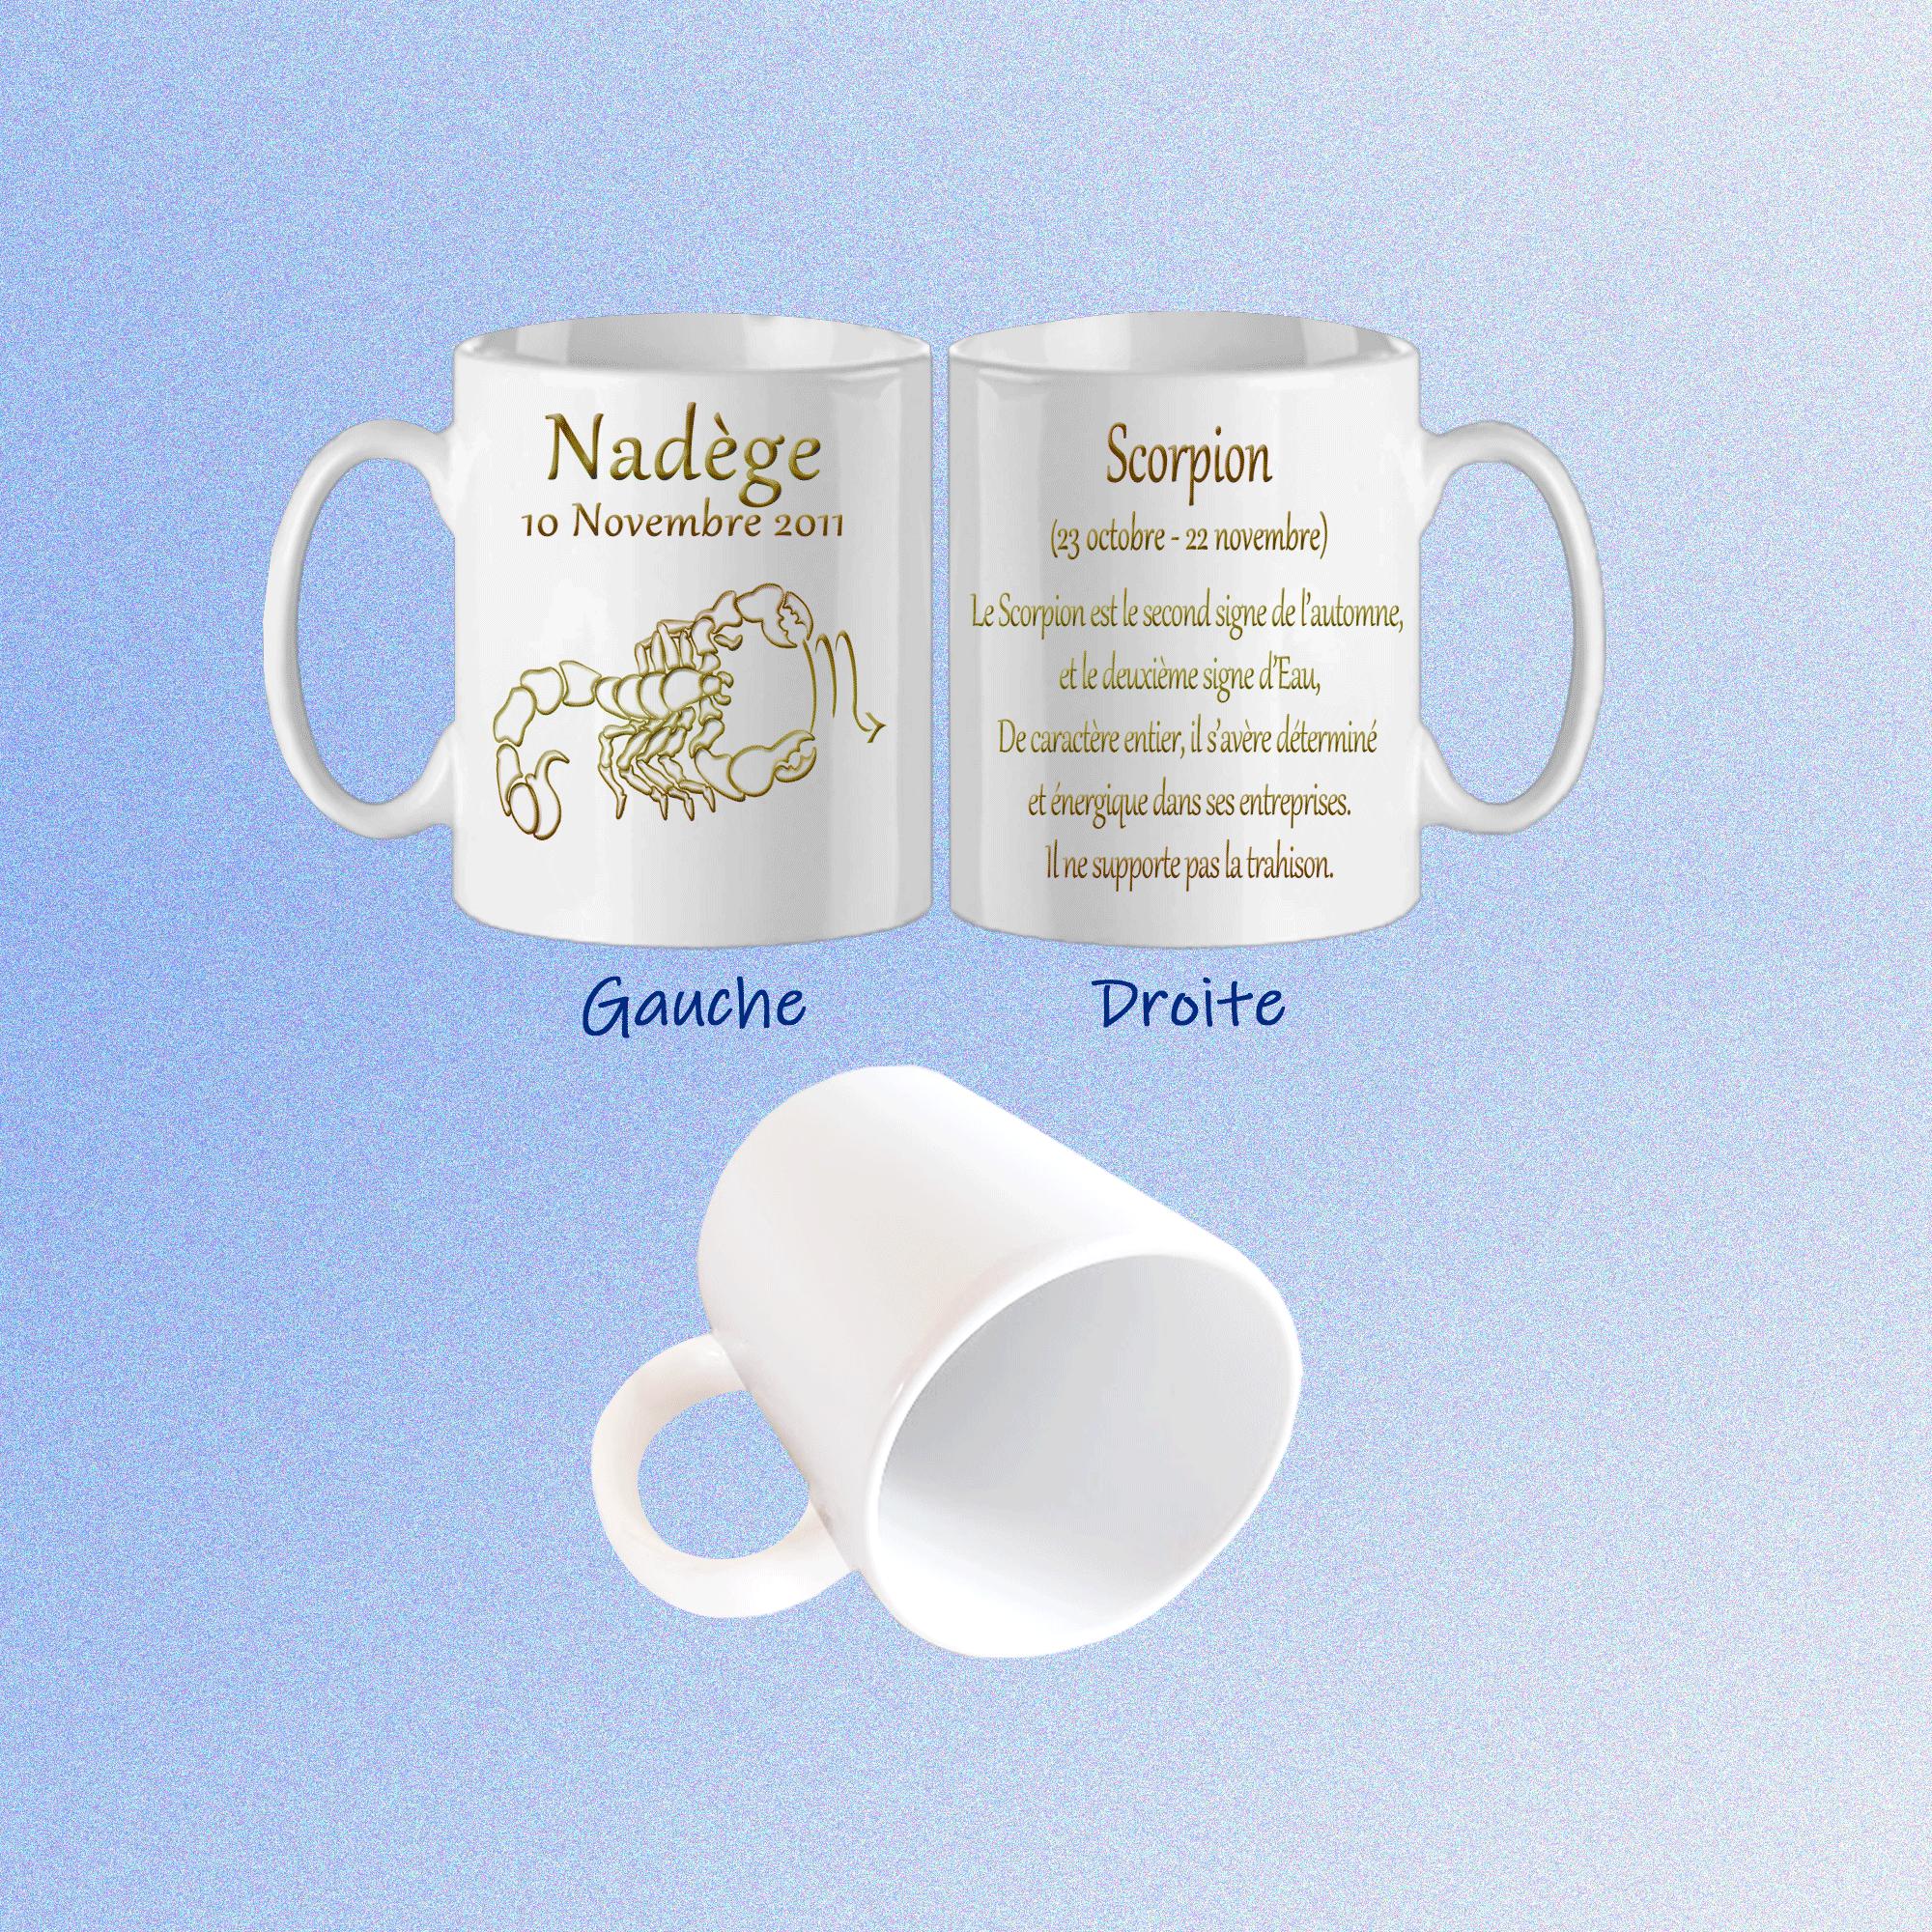 mug-texticadeaux-blanc-astrologie-zodiaque-scorpion-personnalise-personnalisation-personnalisable-date-naissance-prenom-nadege